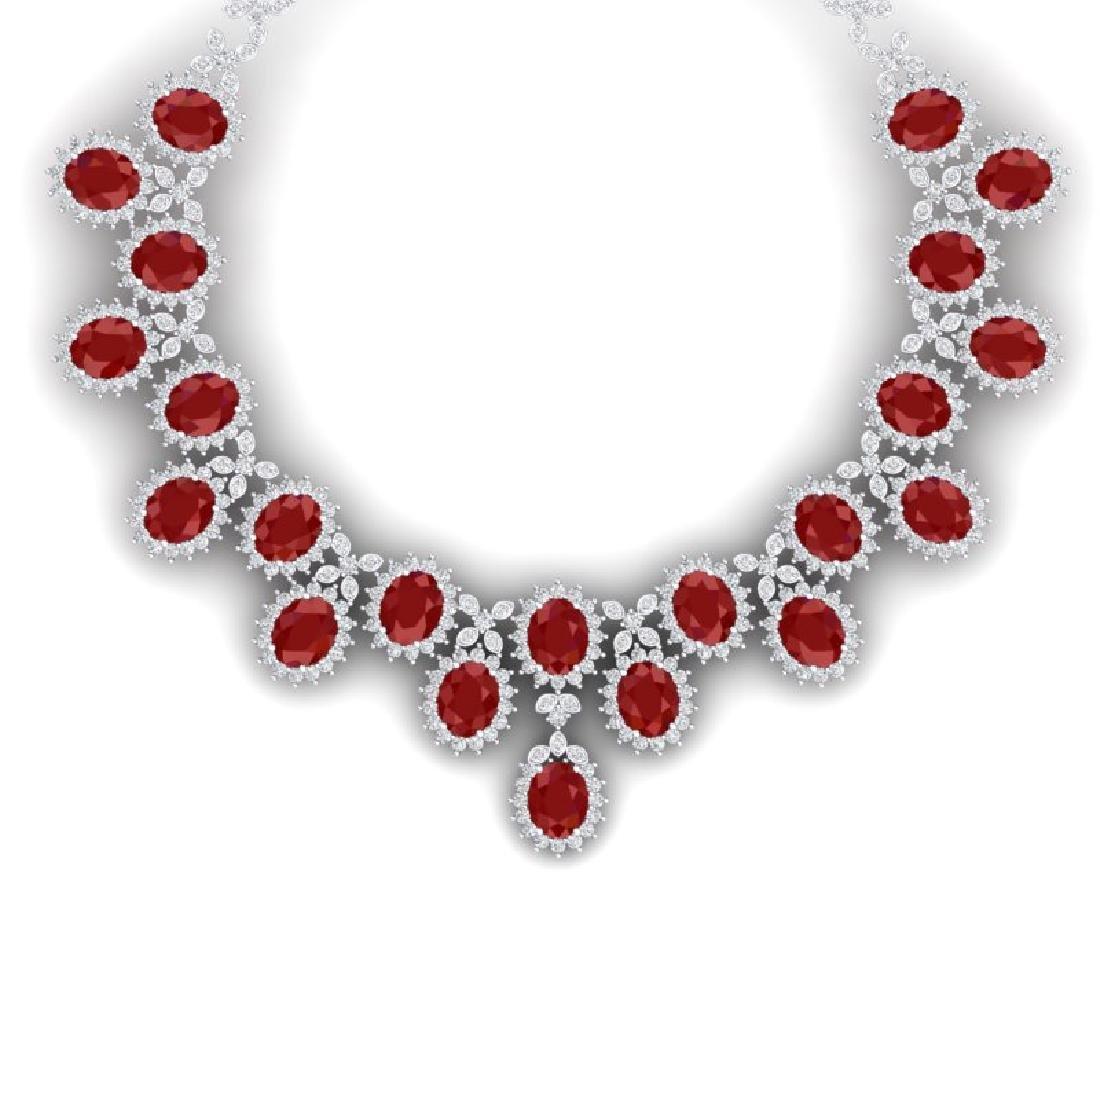 81 CTW Royalty Designer Ruby & VS Diamond Necklace 18K